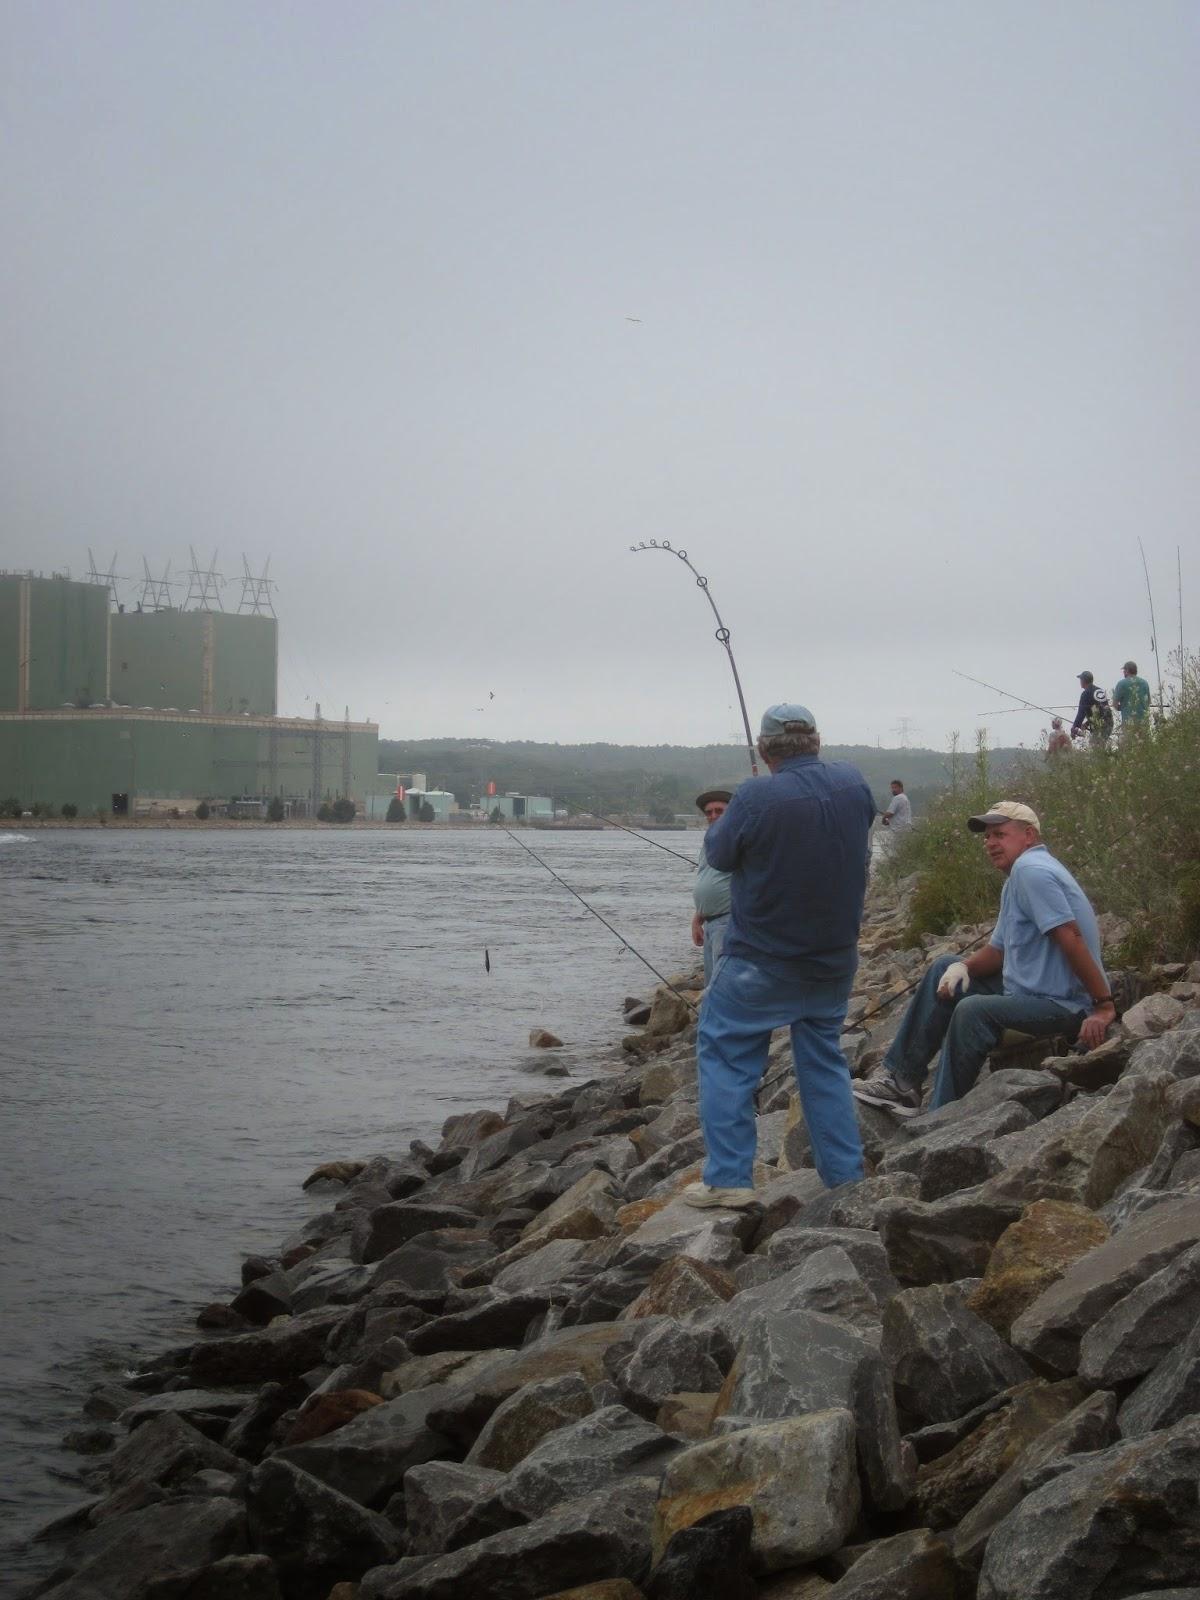 Rhode island striped bass cape cod canal alert for Cod fishing ri